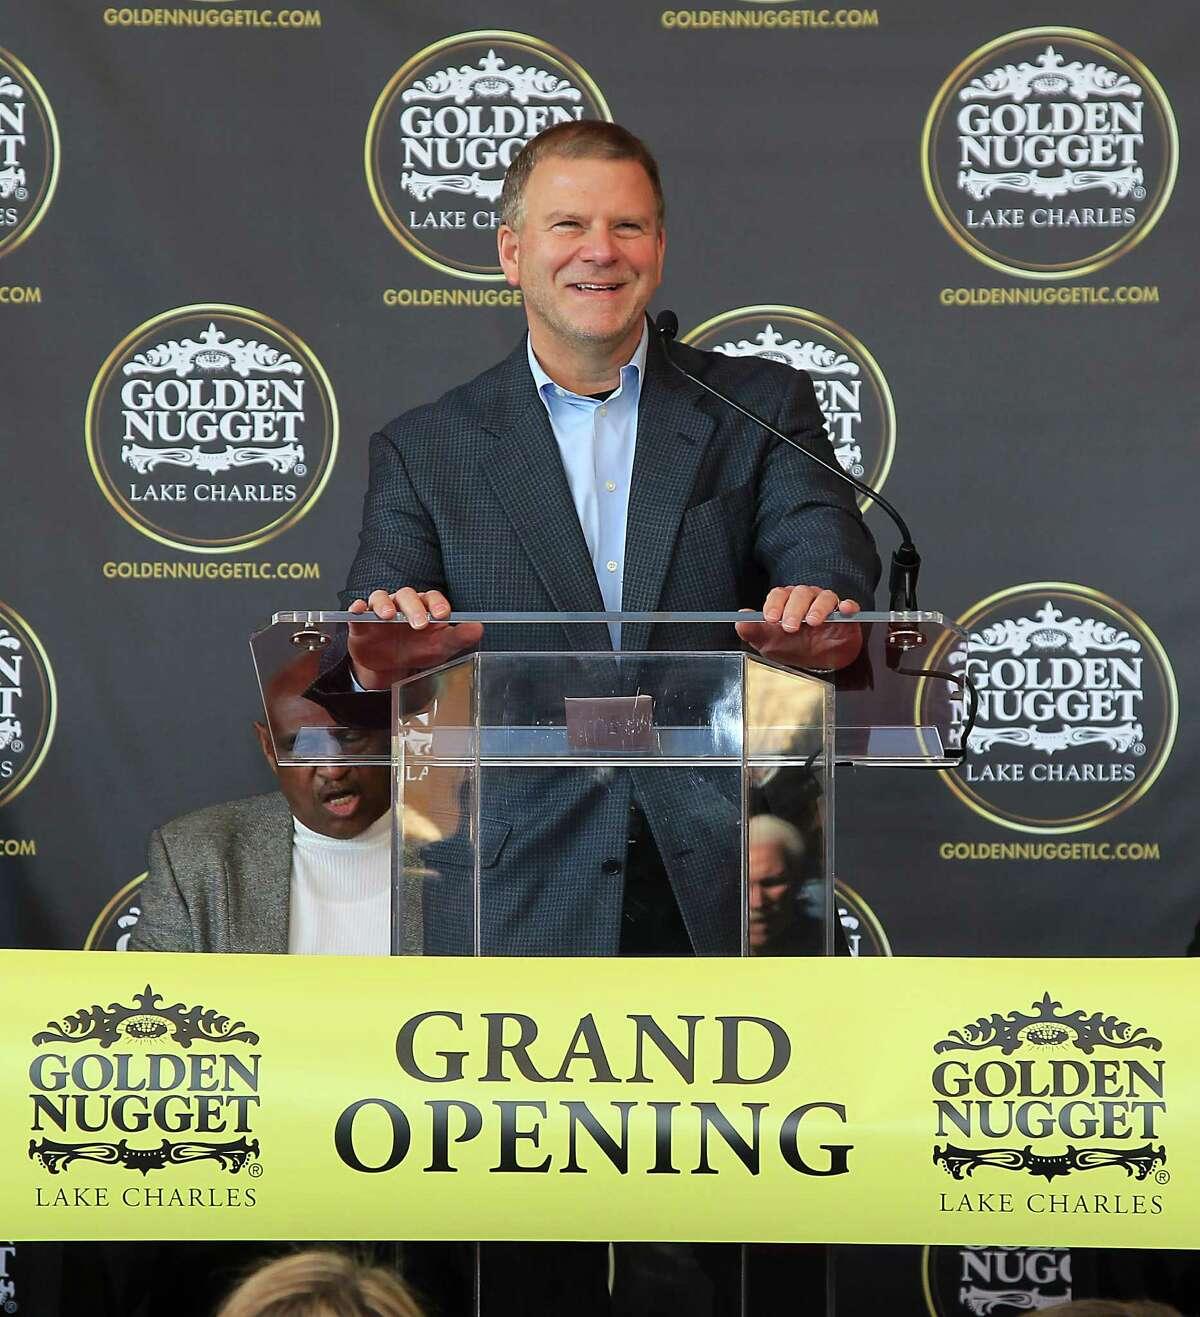 Golden Nugget Hotel & Casino owner Tilman Fertitta speaks during the ribbon cutting ceremony Monday, Dec. 8, 2014, in Lake Charles. ( James Nielsen / Houston Chronicle )